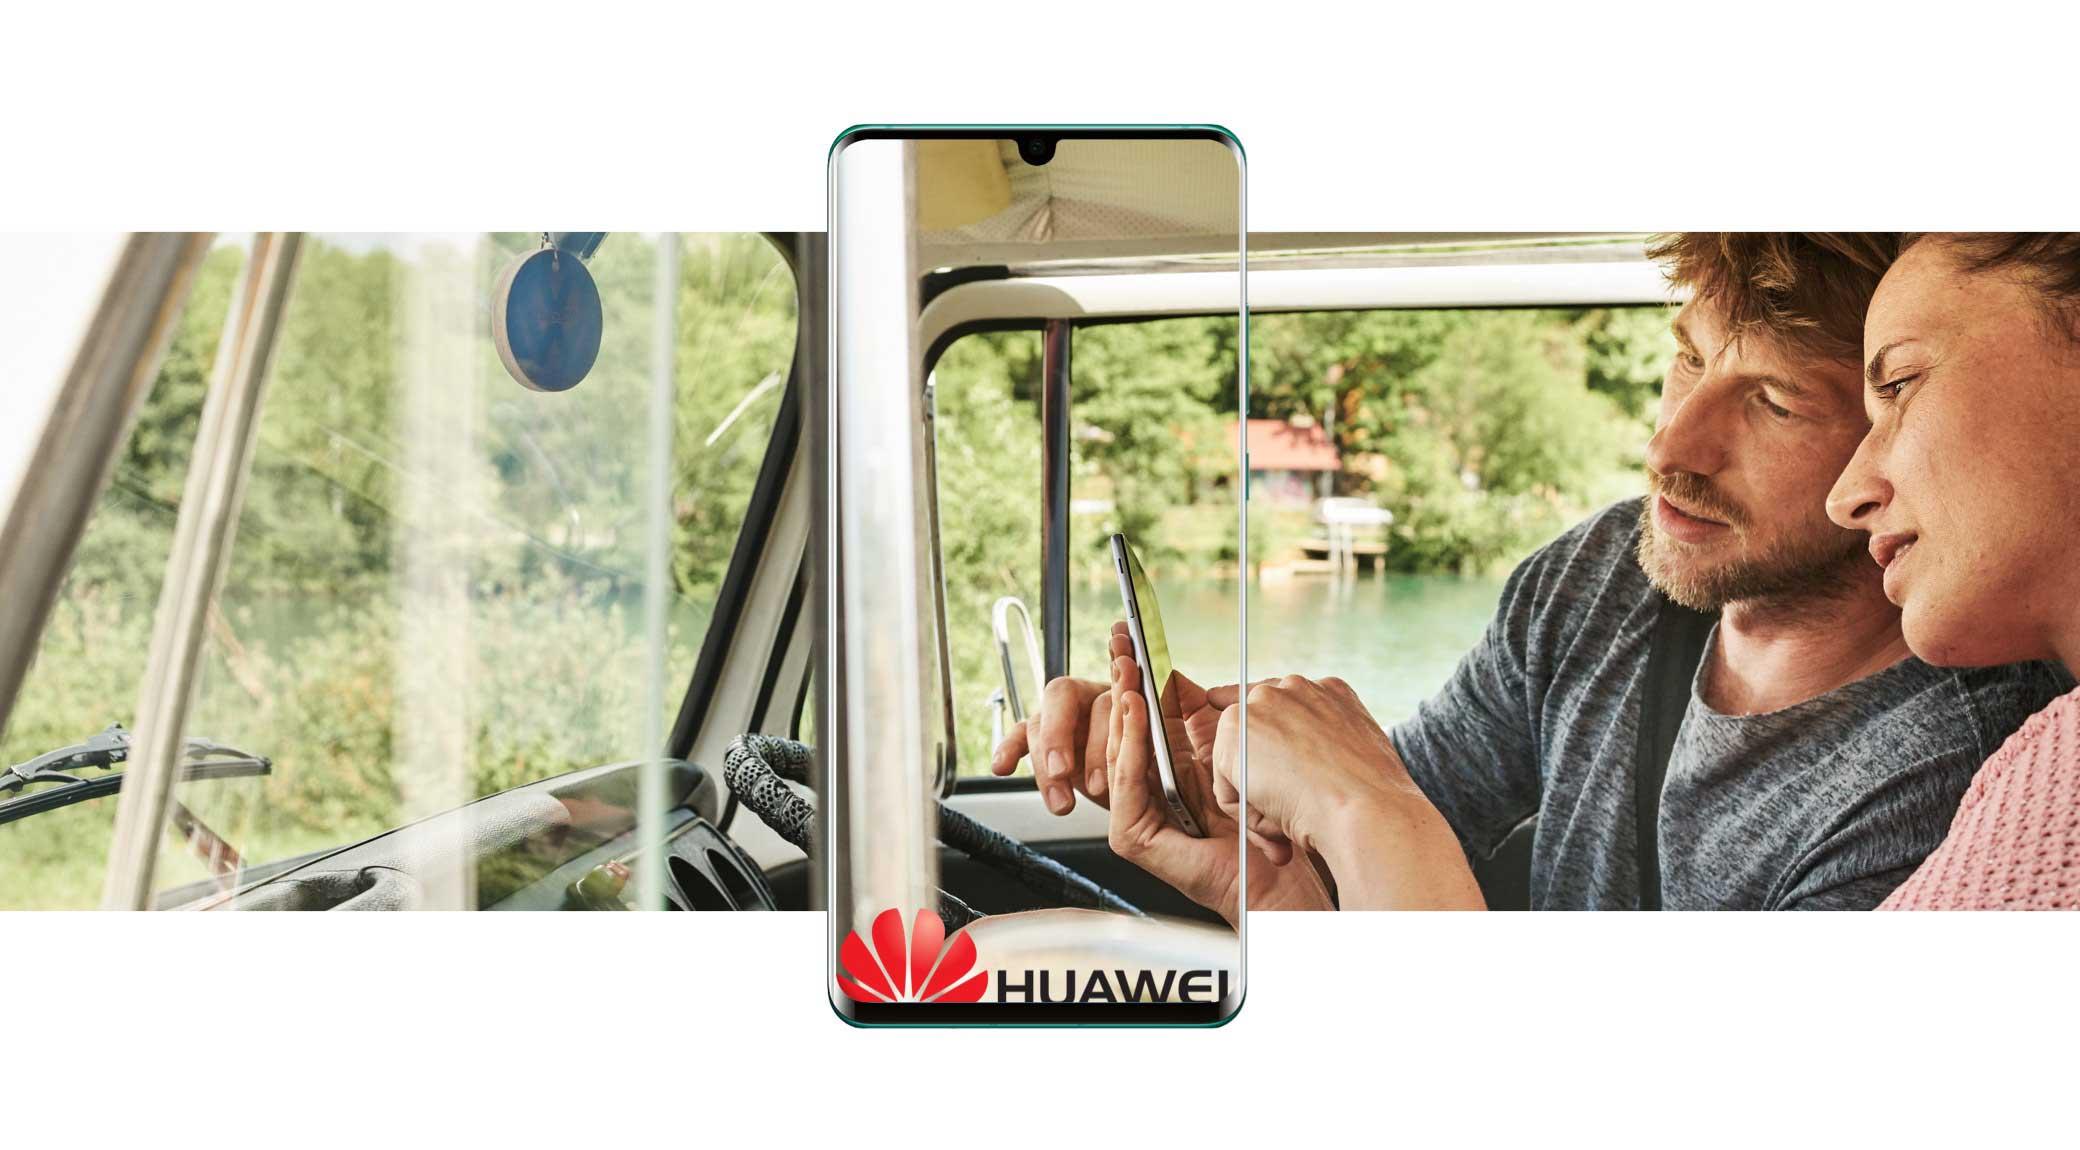 Telekom 5G Mobilfunk Endgeräte Huawei